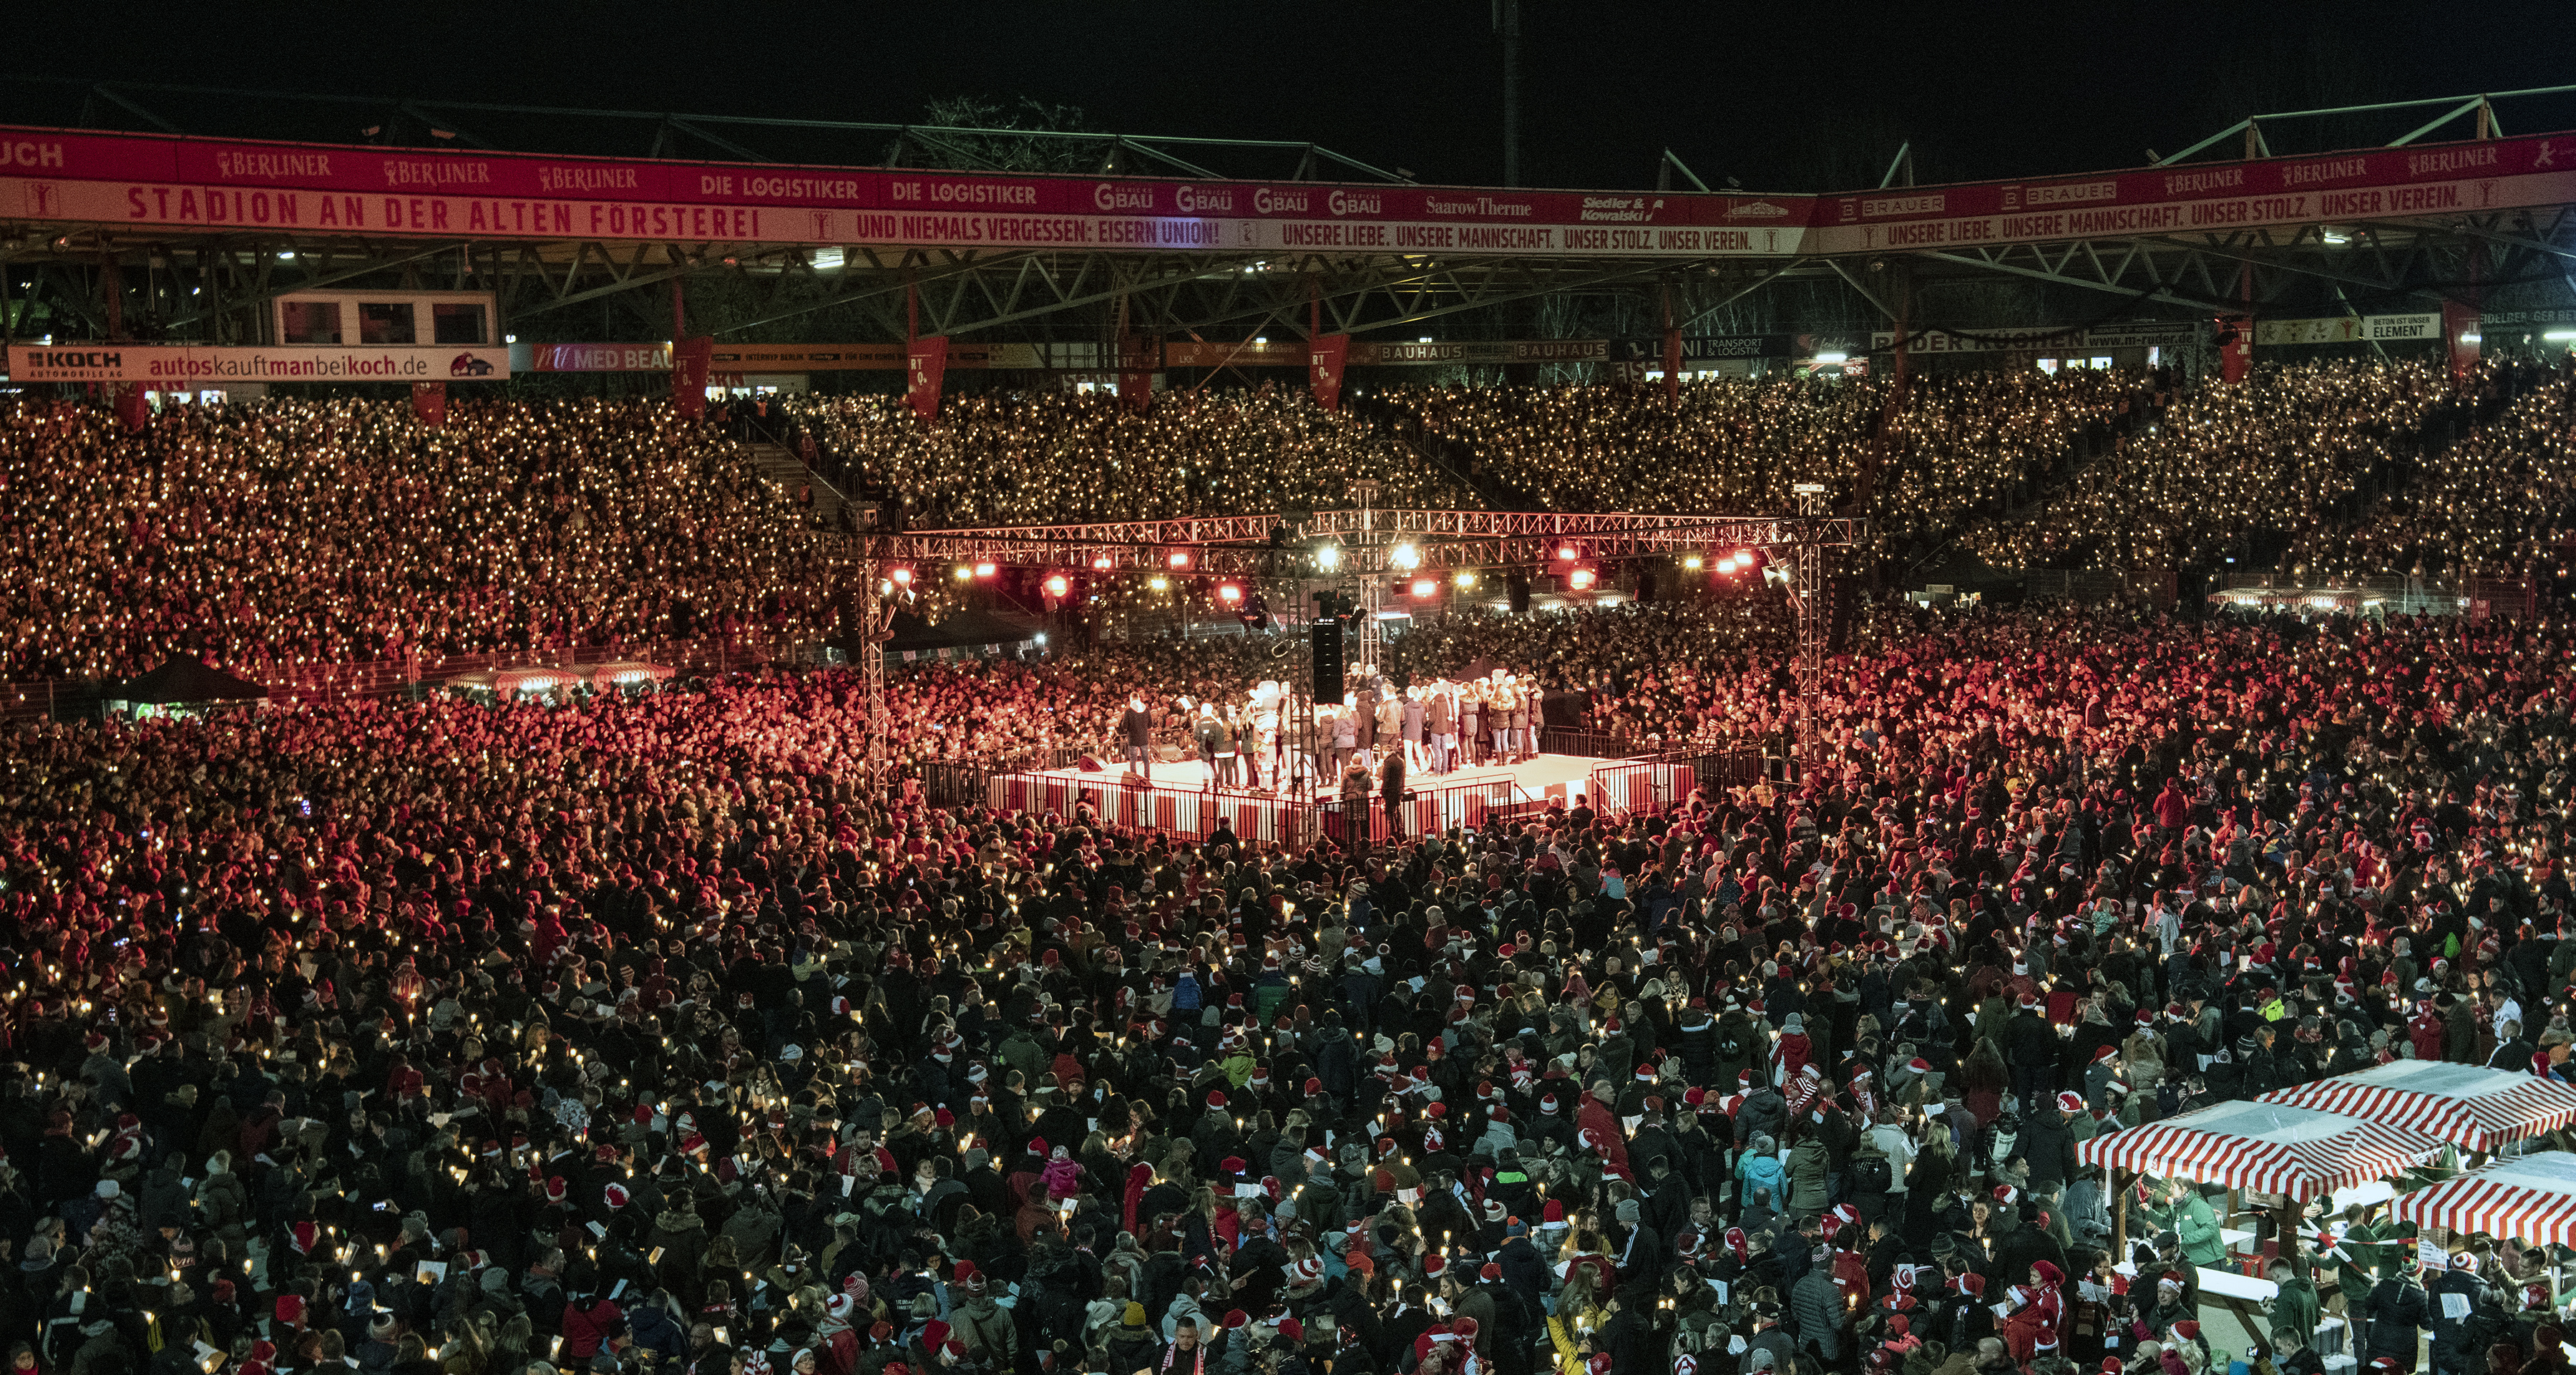 28,500 Union Berlin fans gather to sing Christmas carols